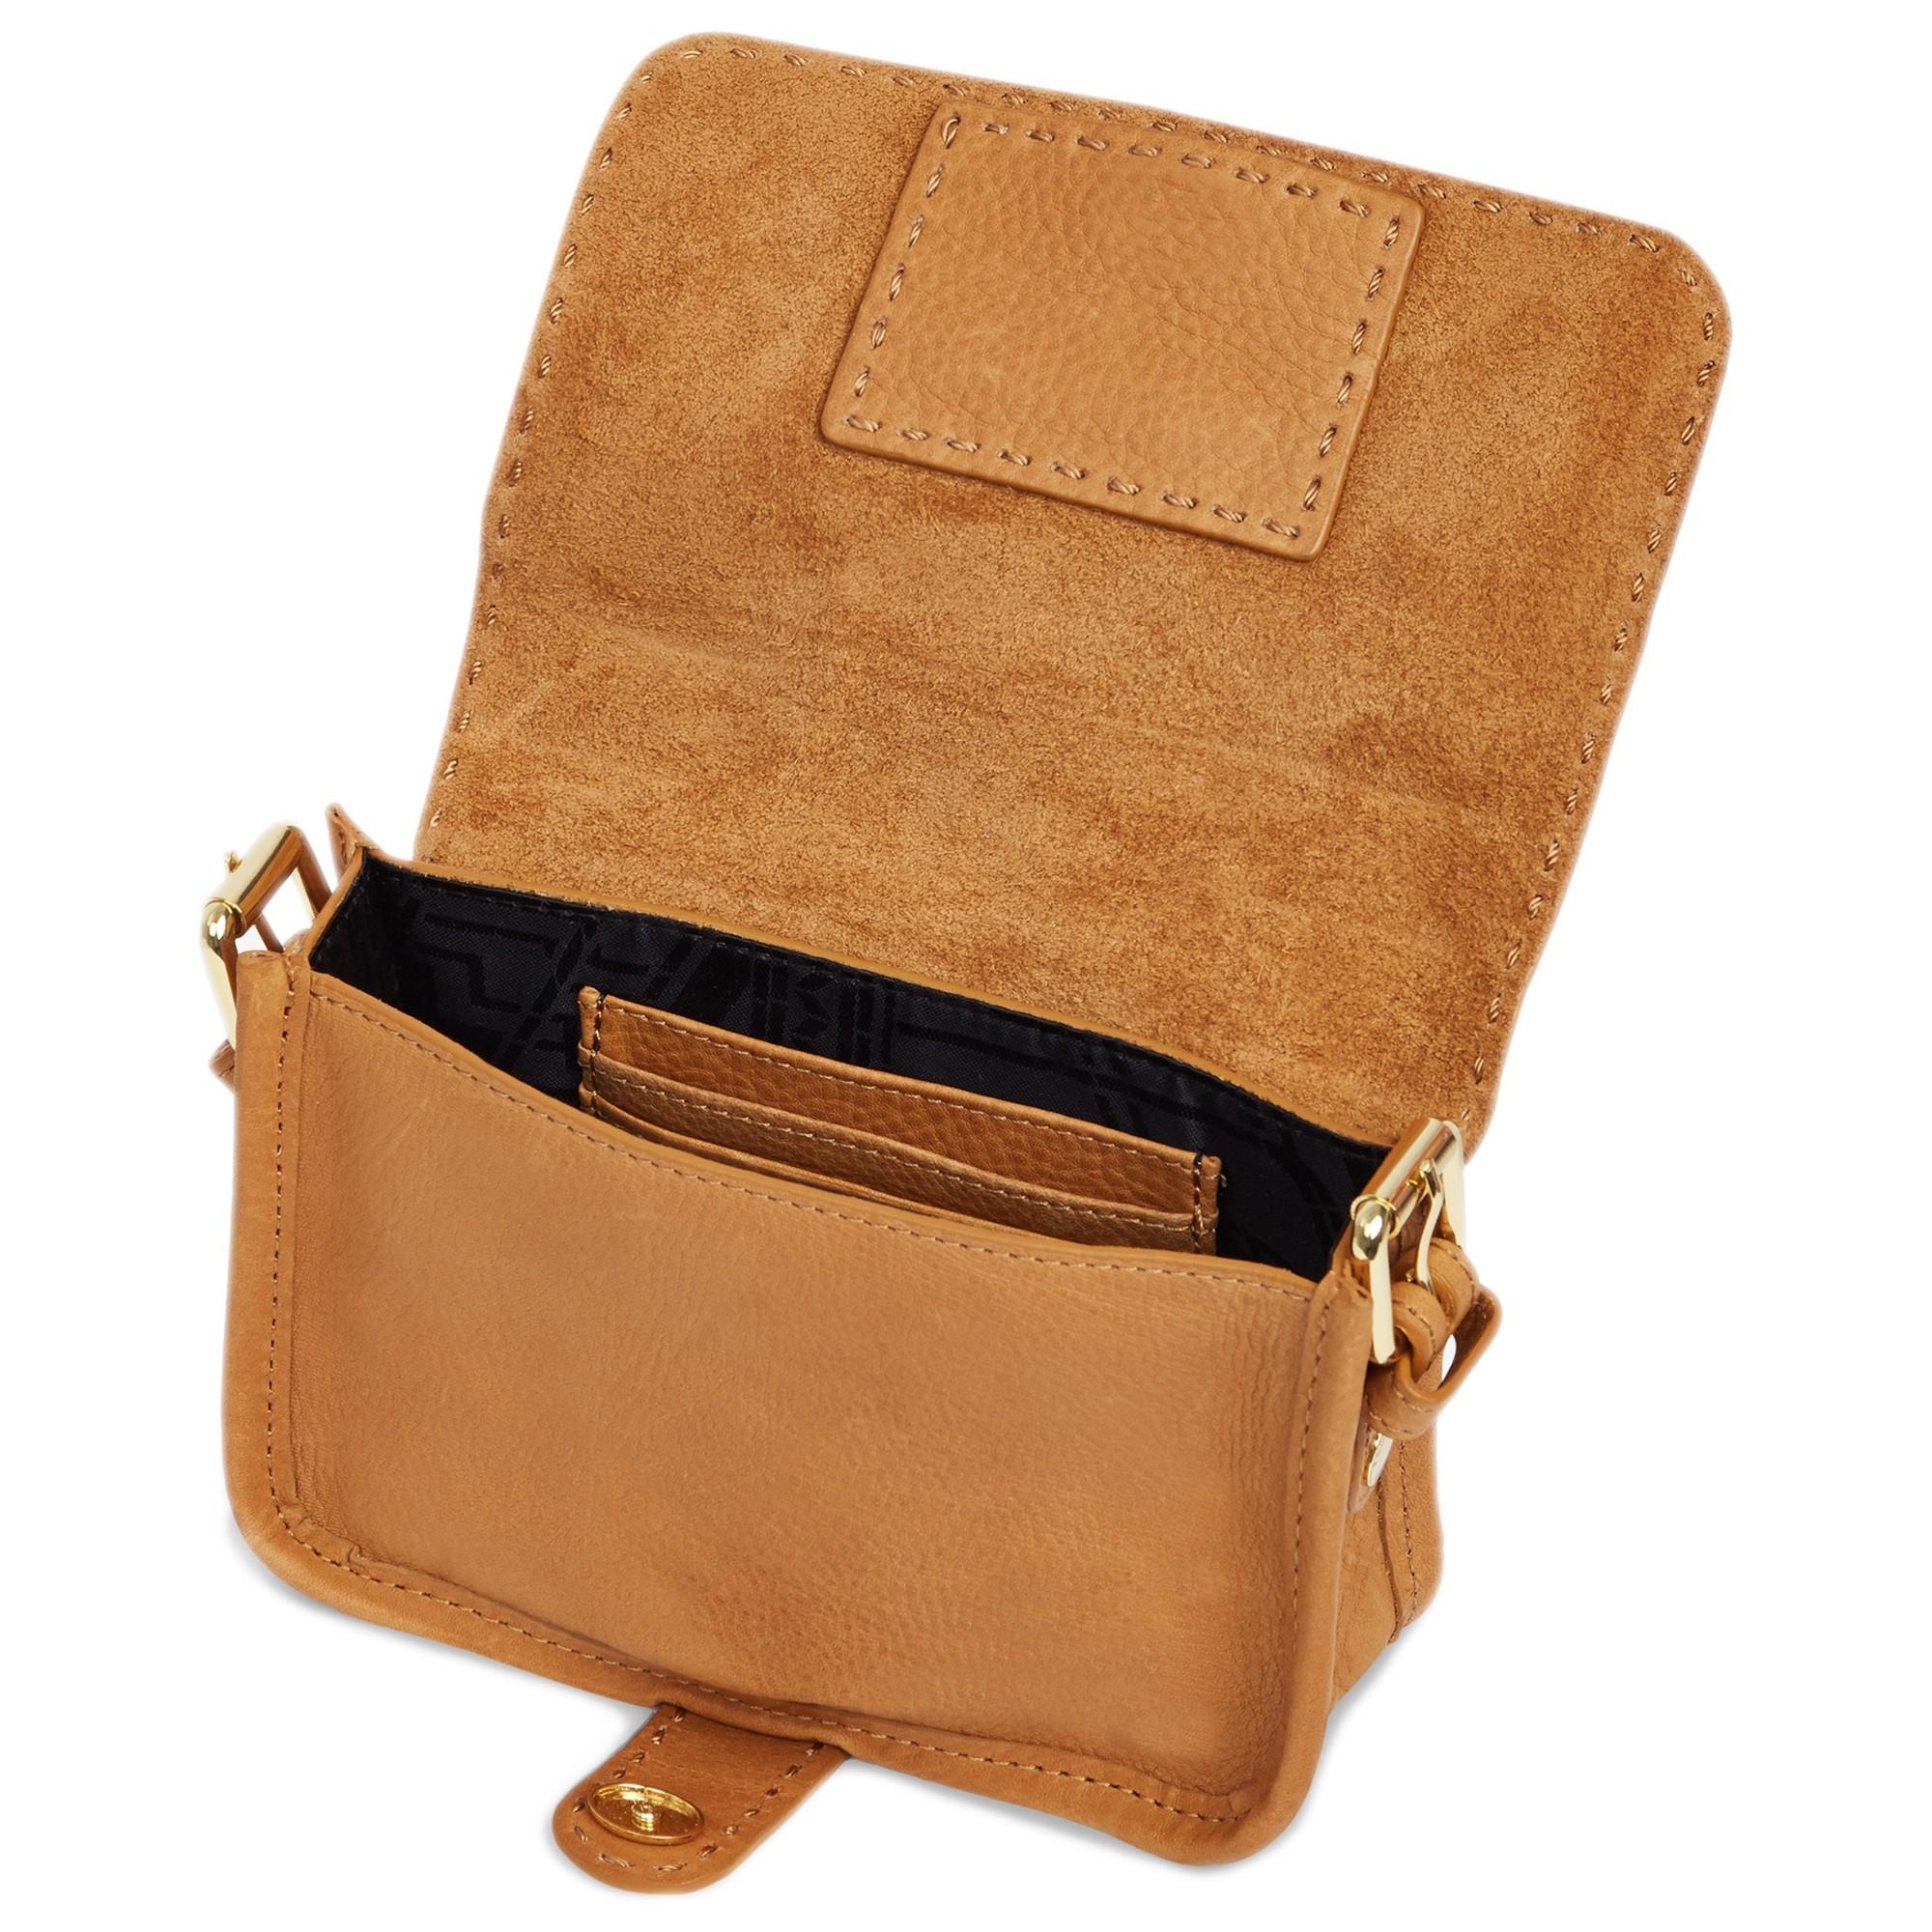 Ted Baker Minimar Stab Stitch Leather Cross Body Bag in Brown - Lyst bd50565f0de11